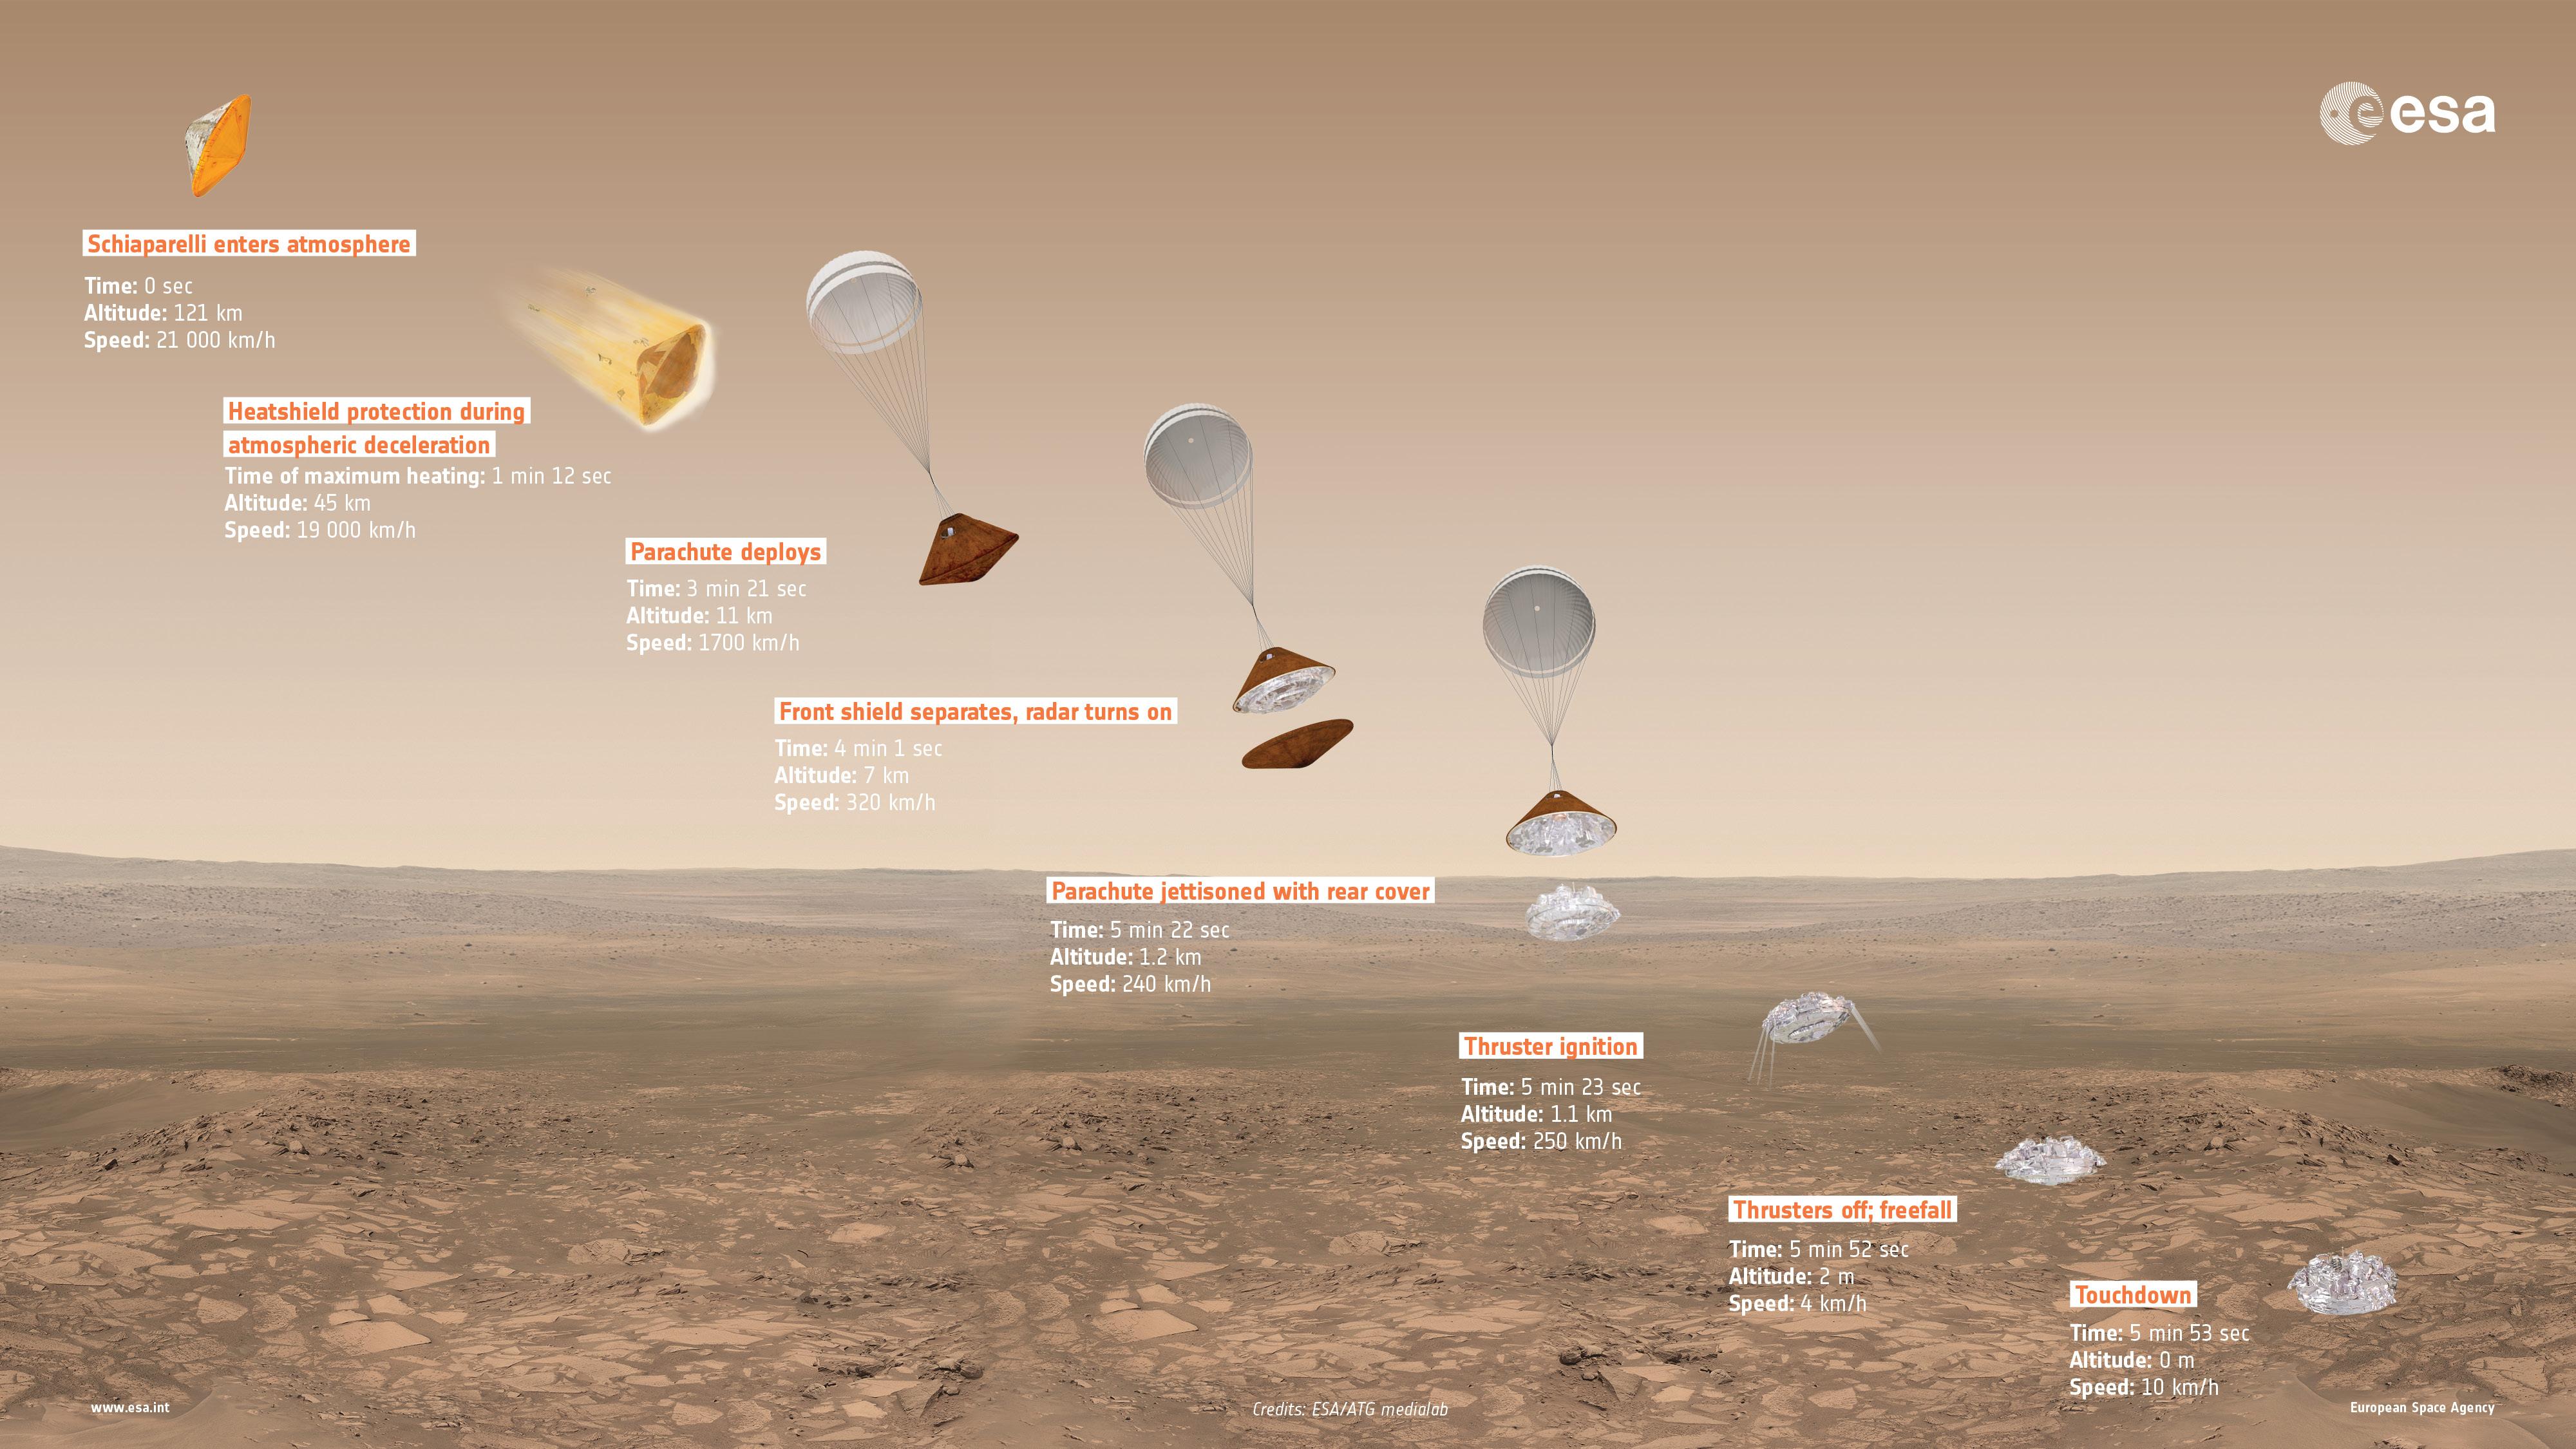 ExoMars/TGO operations / Operations / Our Activities / ESA